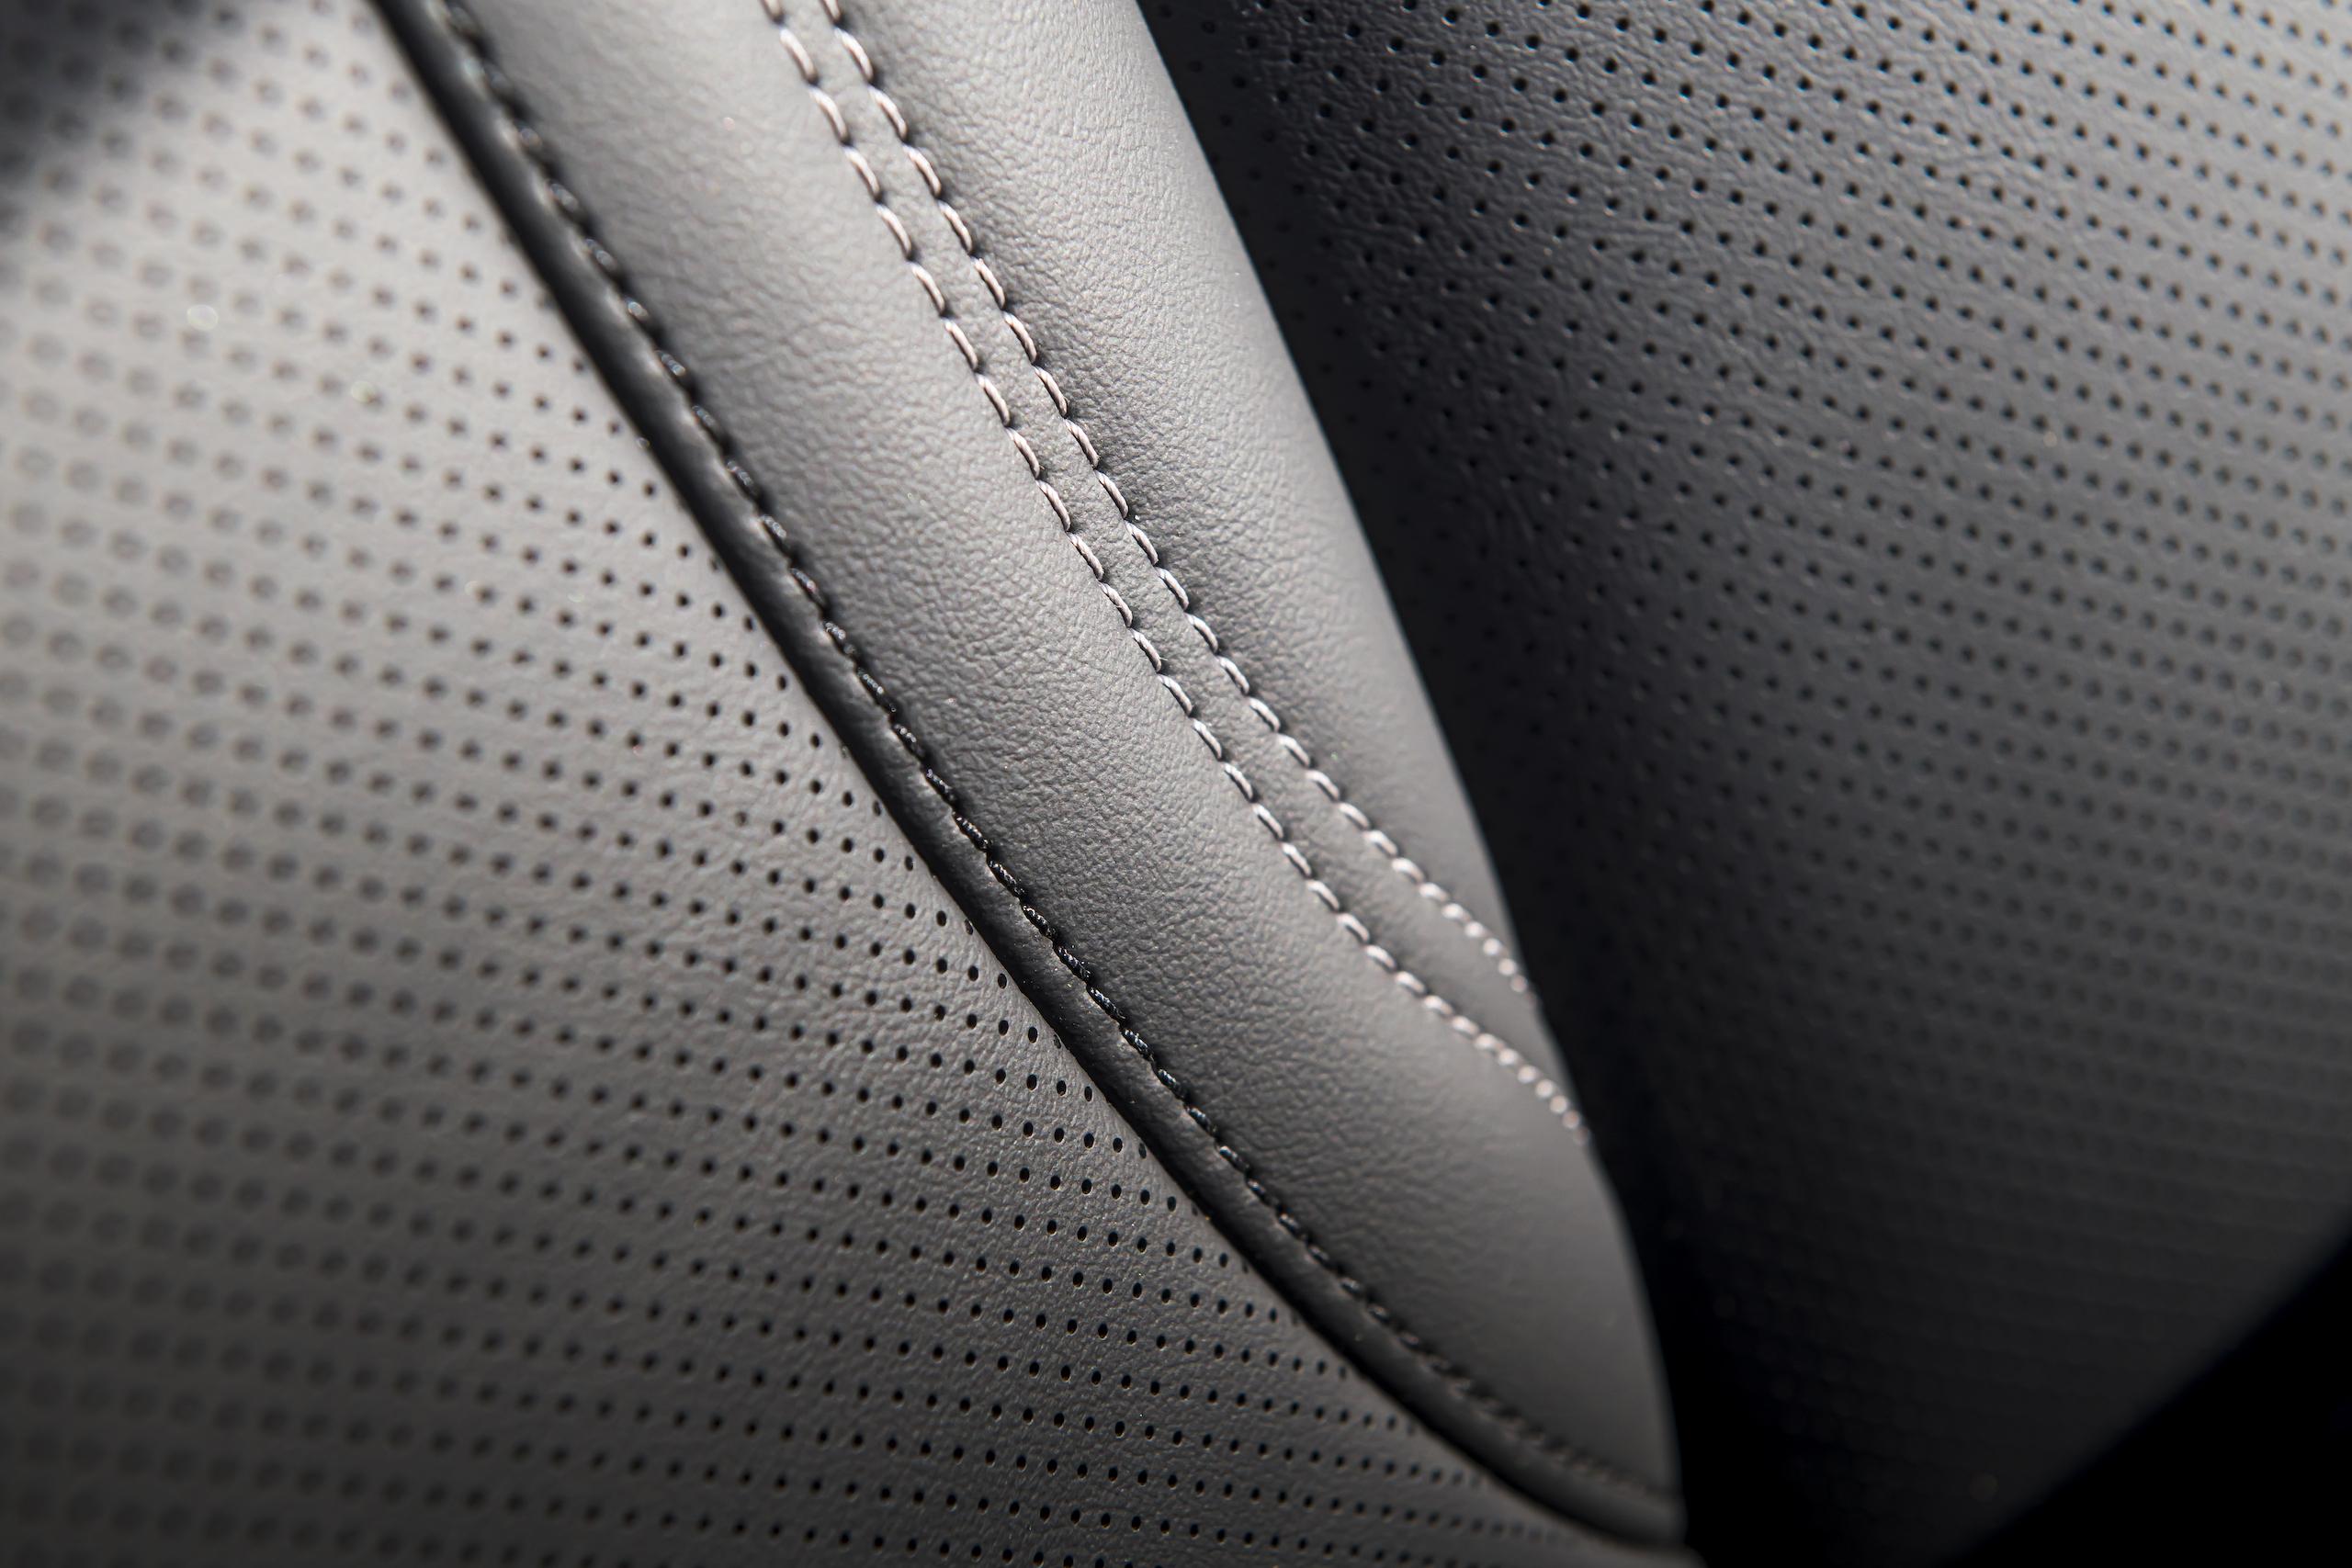 Mustang Mach-E seat stitch detail